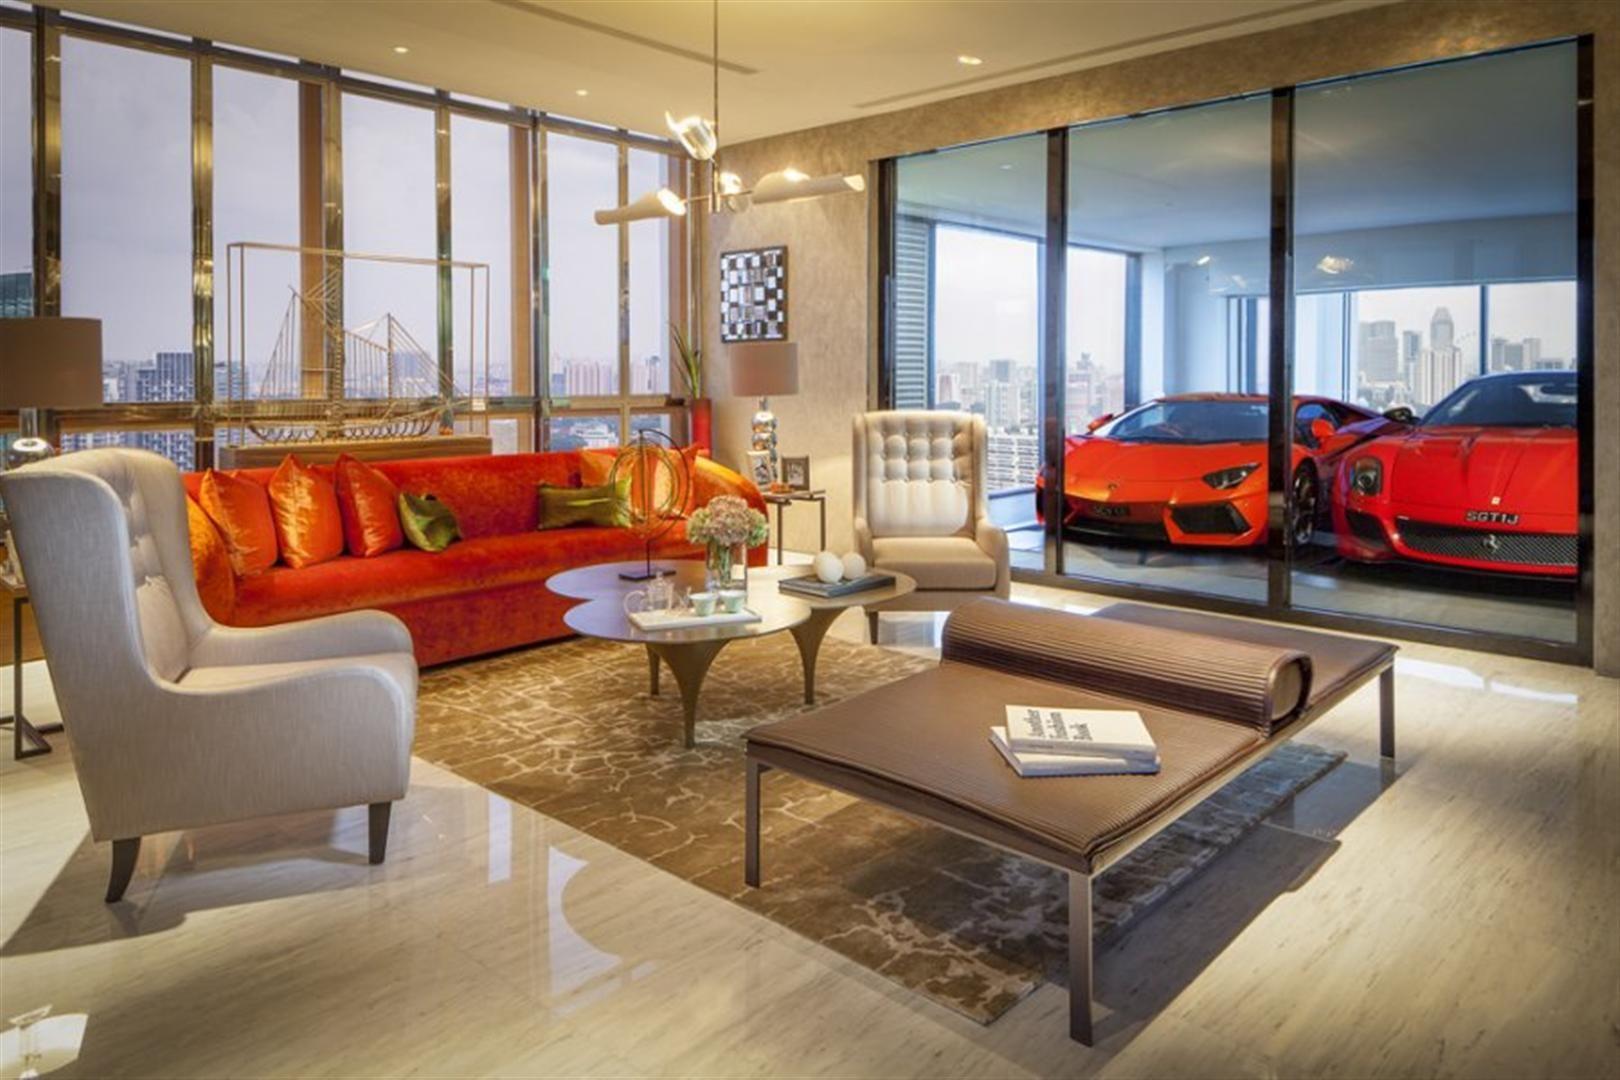 Incredible en suite sky garage video blog incredible en suite sky garage video solutioingenieria Images